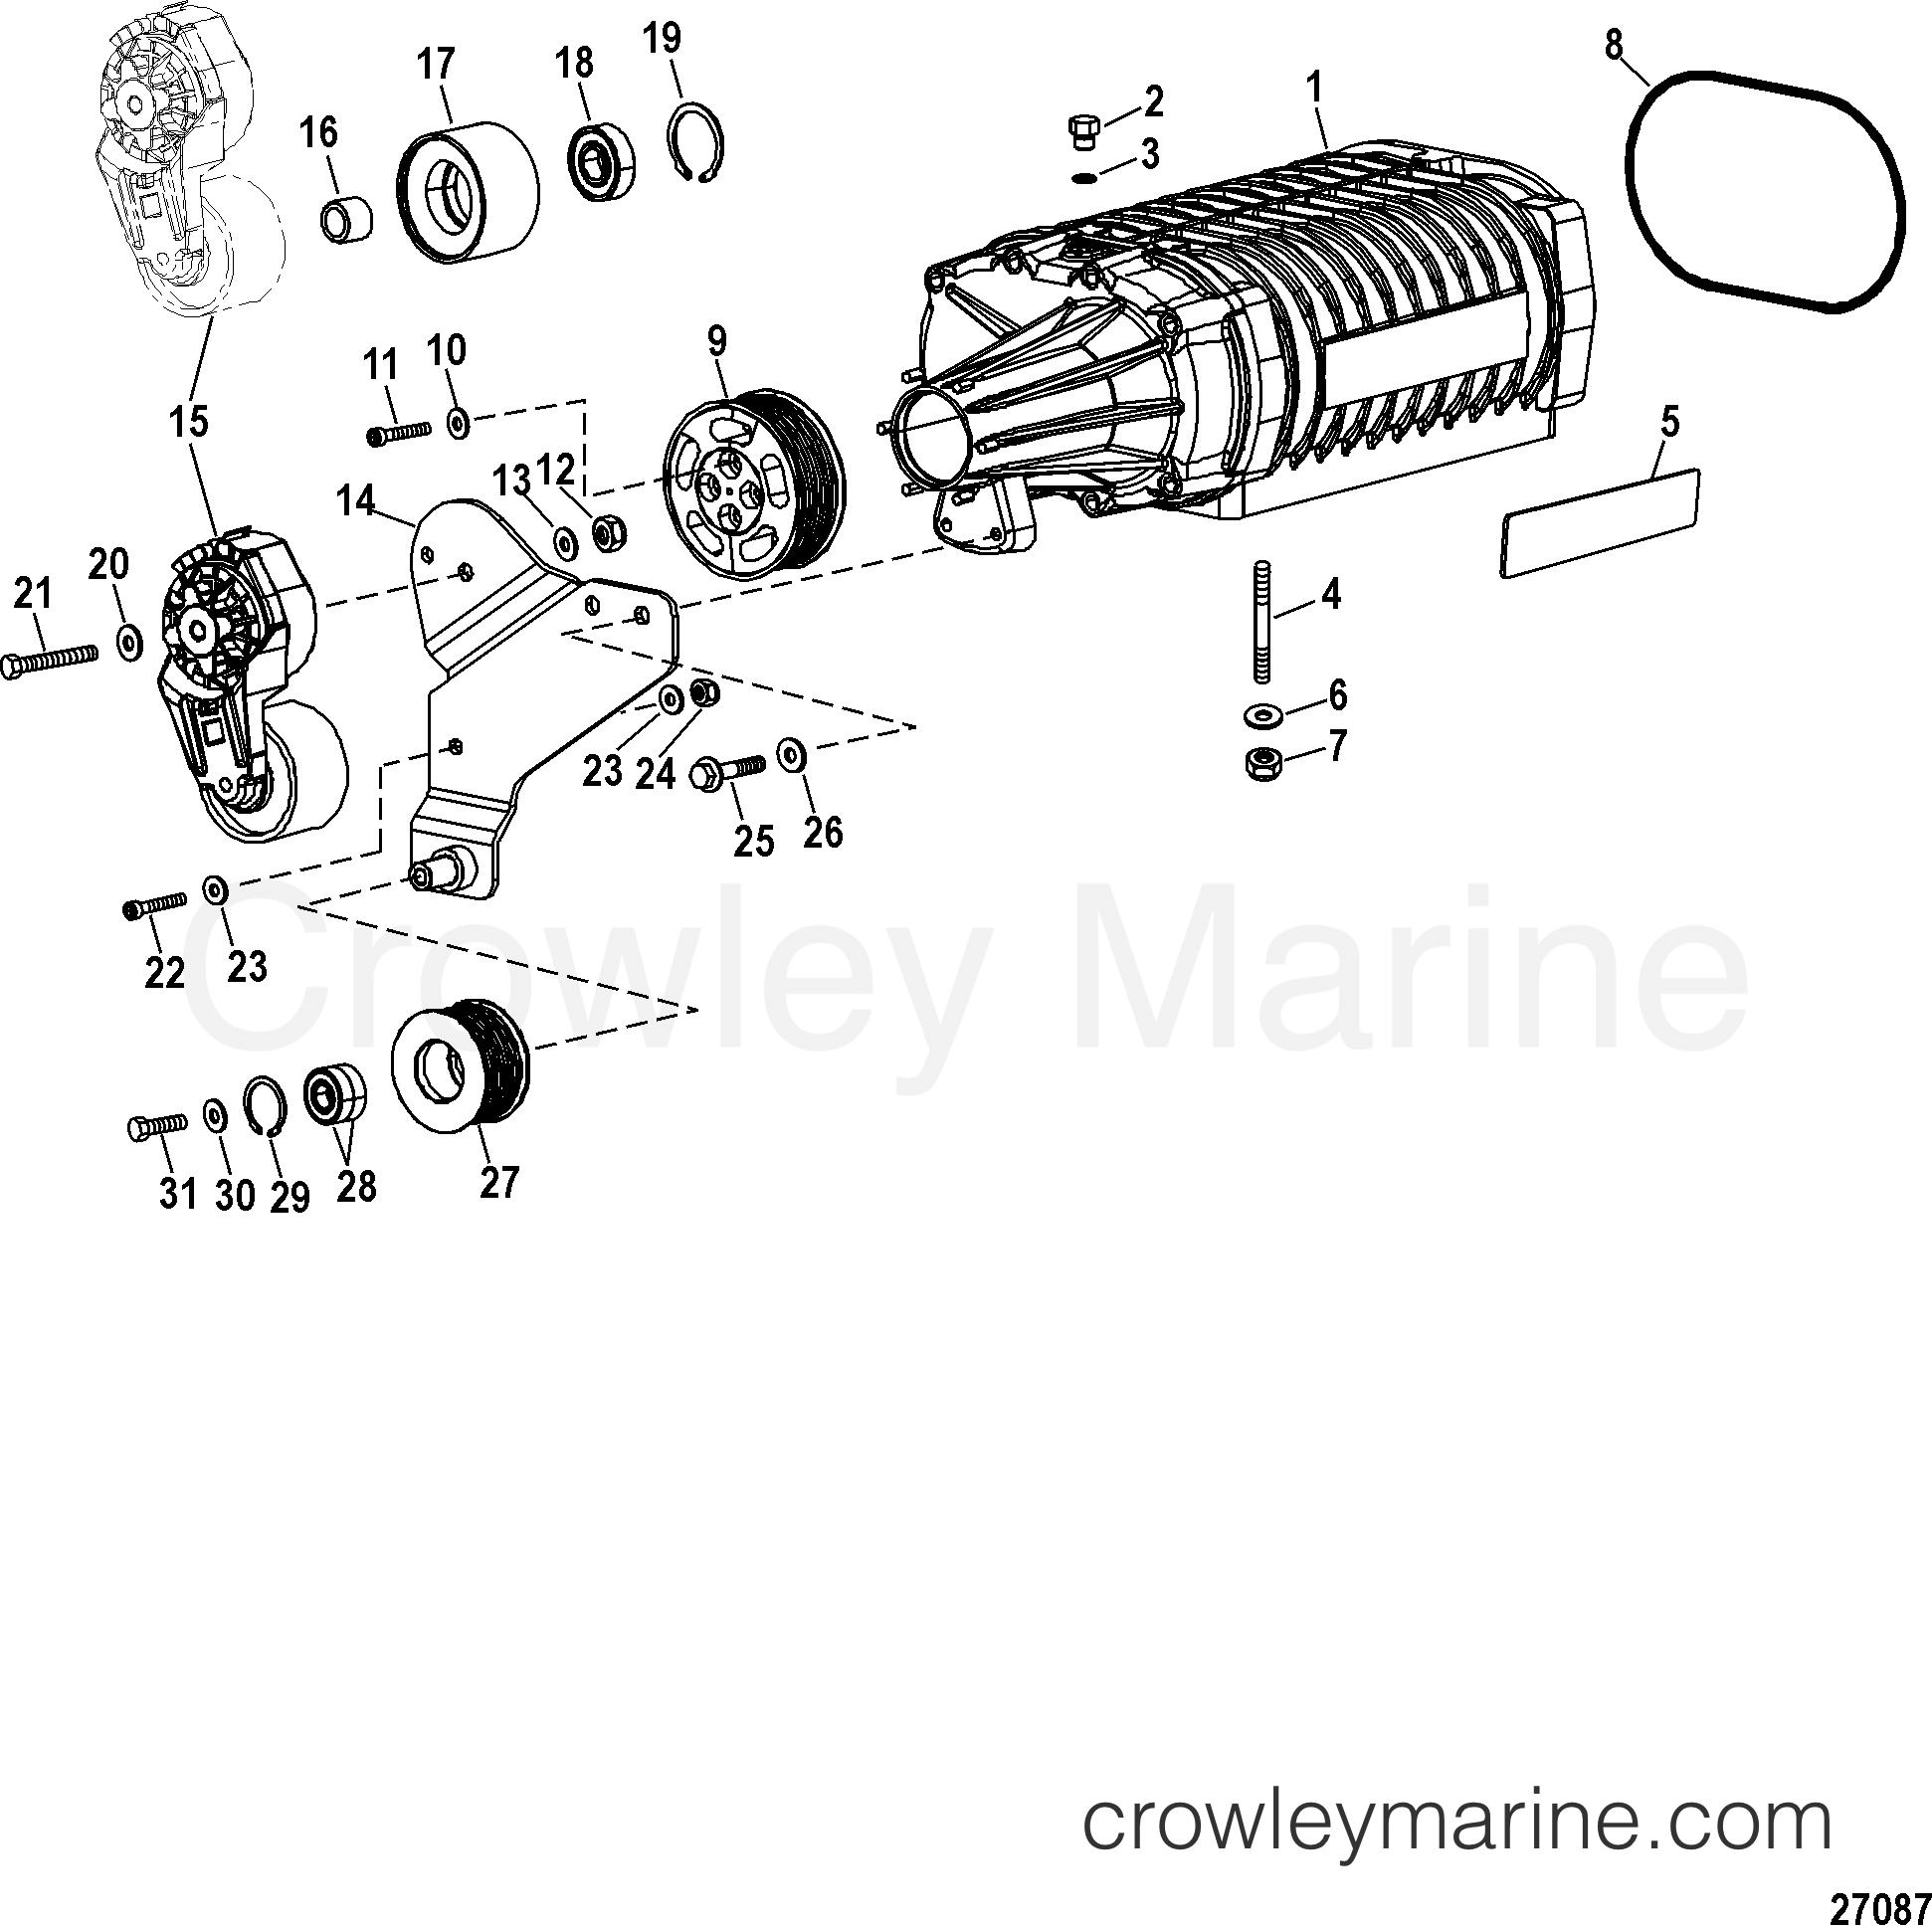 Aluminum Boat Paint Color Charts